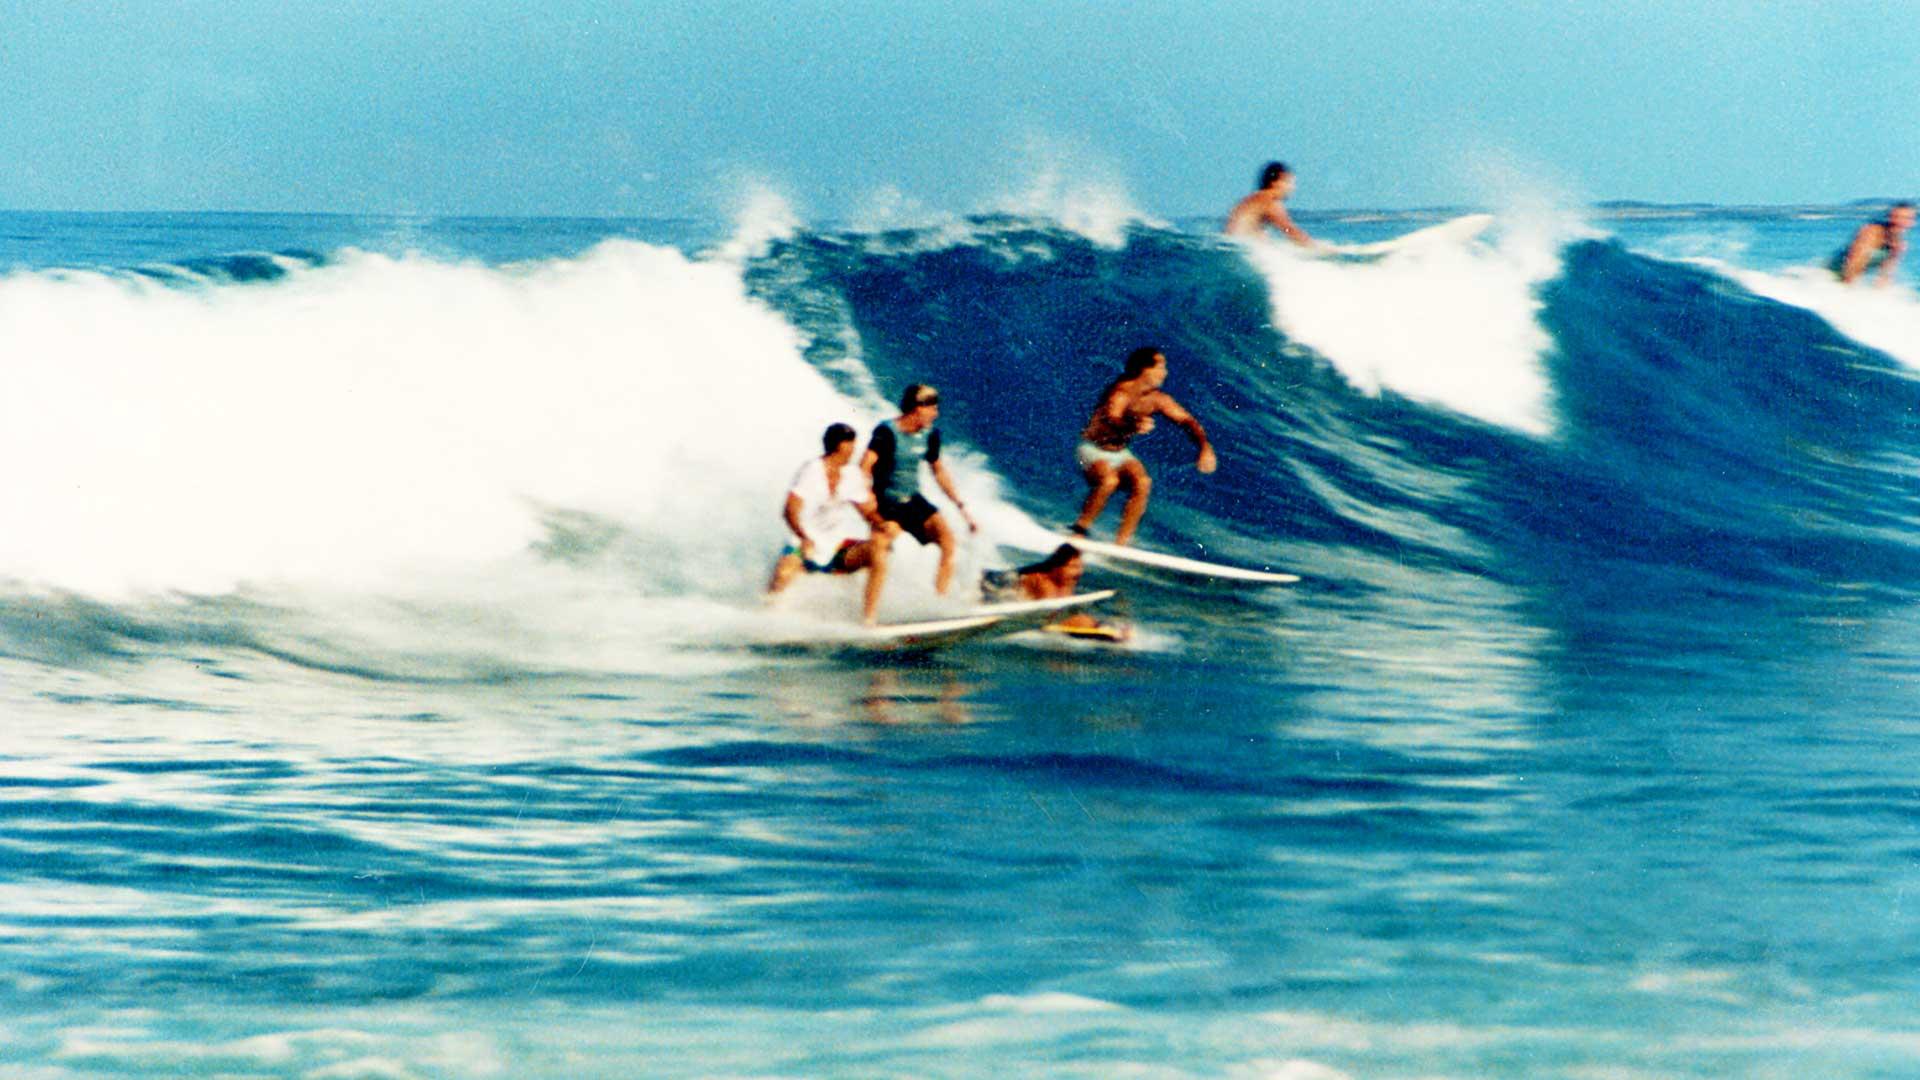 Steven Andrew Martin 1980s – Surfing at Lyman's Point, Kailua-Kona, Big Island